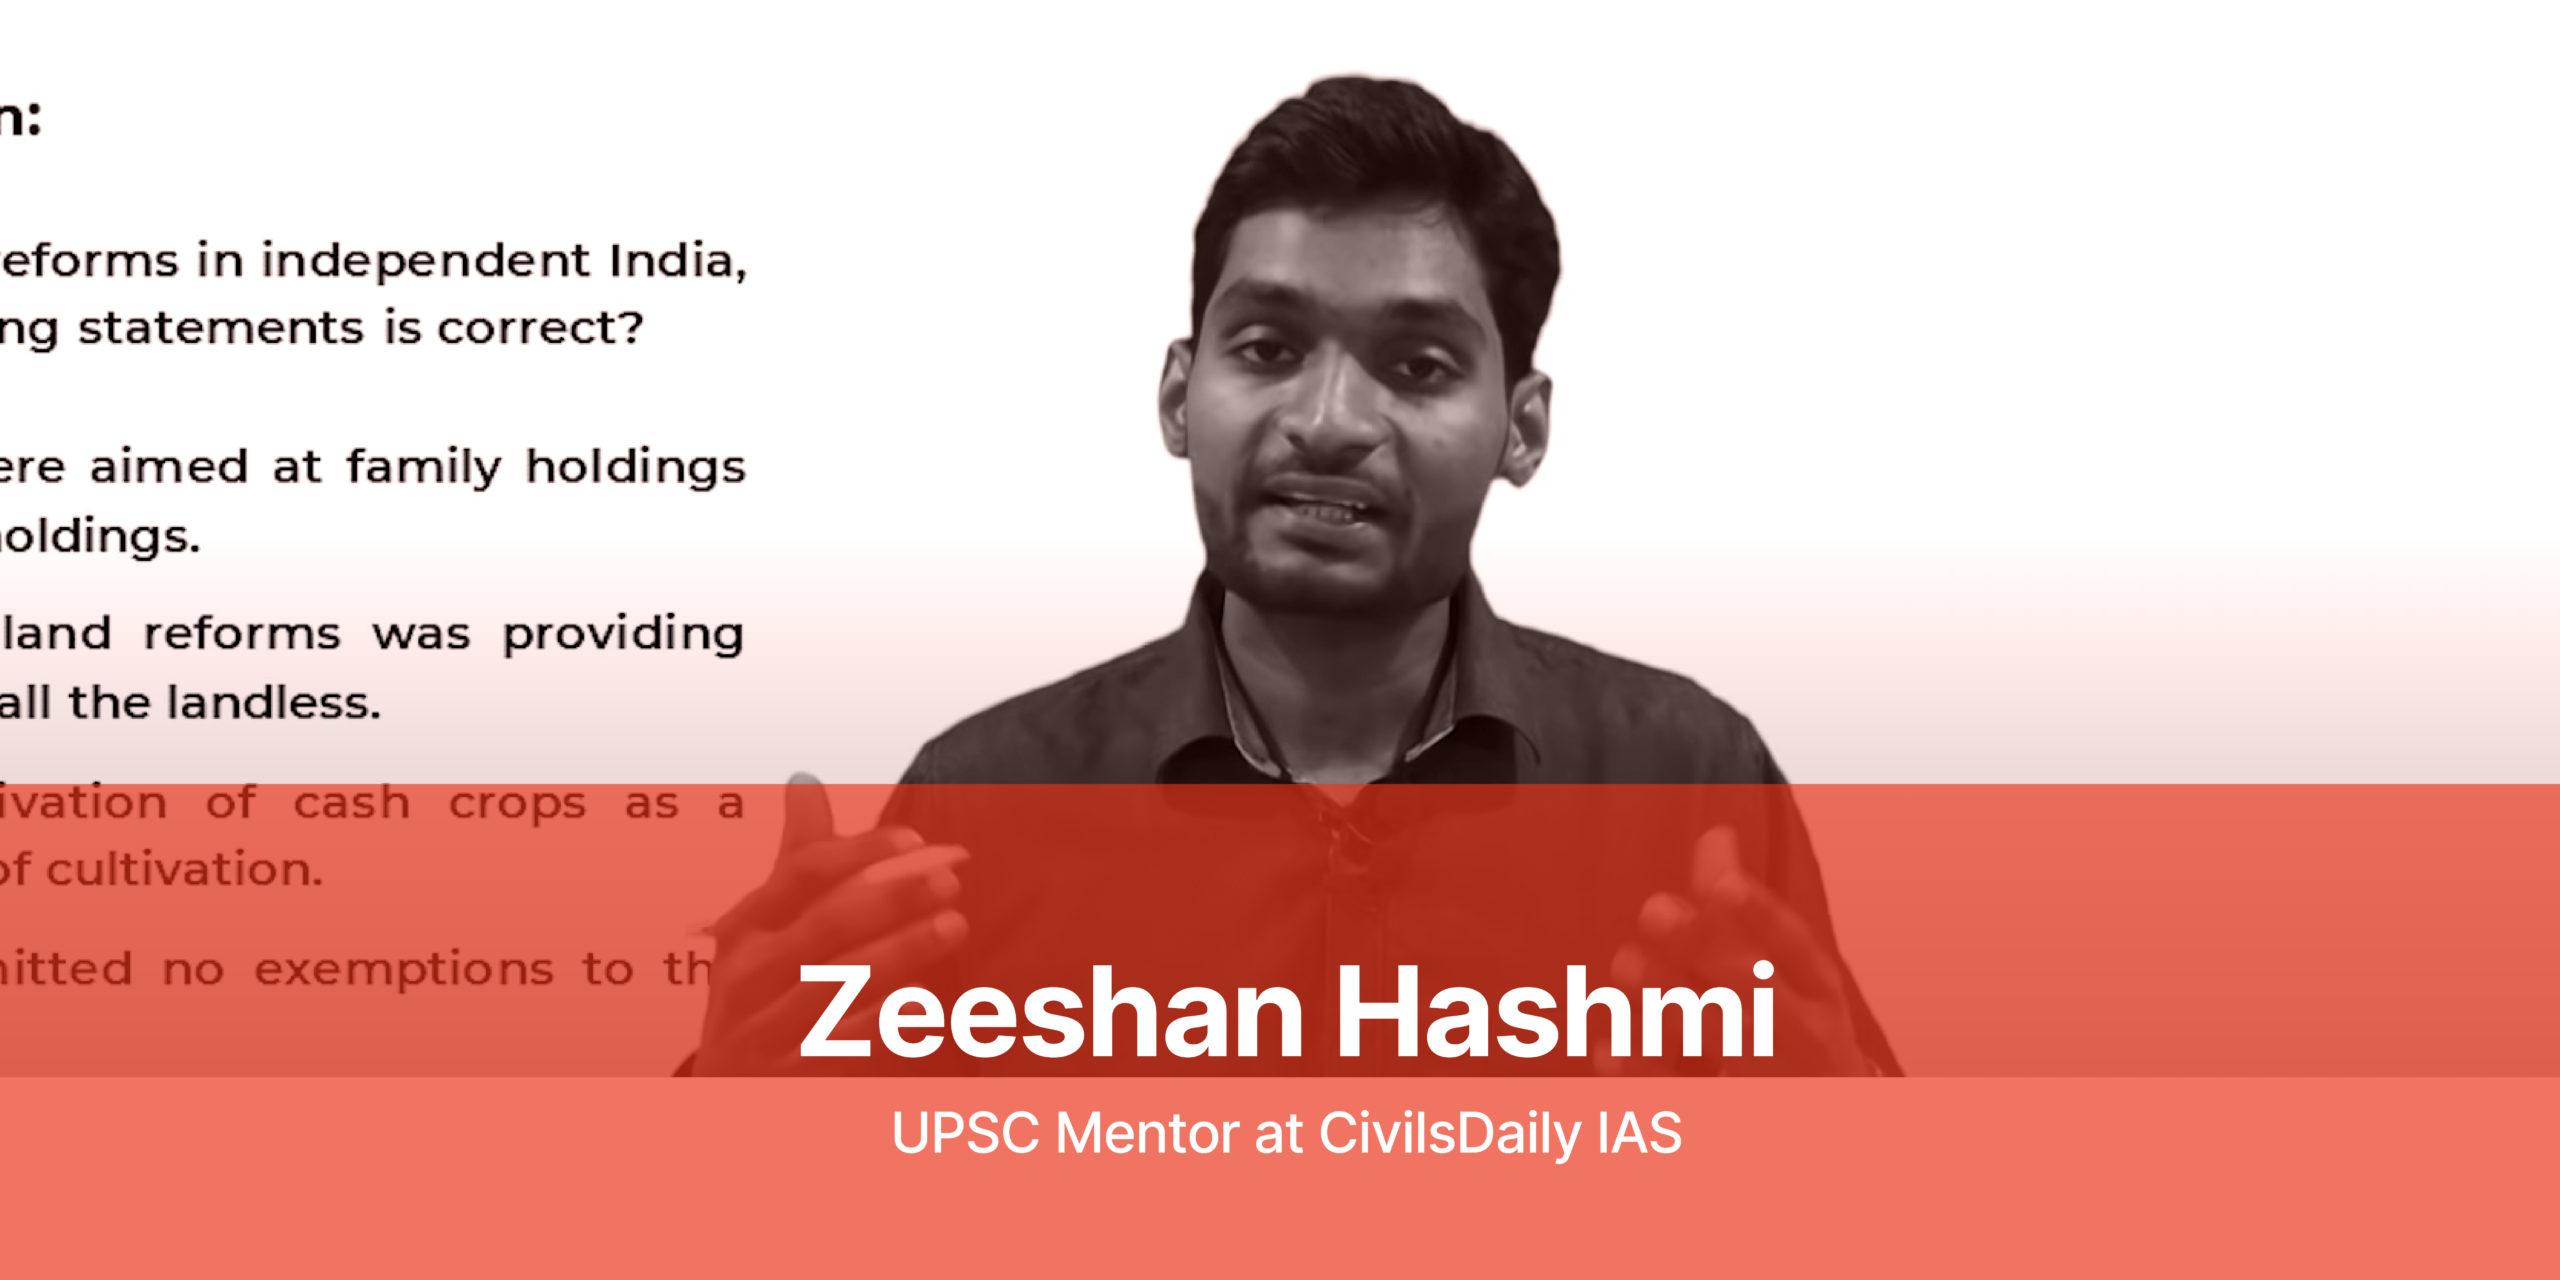 tikdam civilsdaily prelims 2020 UPSC 2021 civilsdaily ias